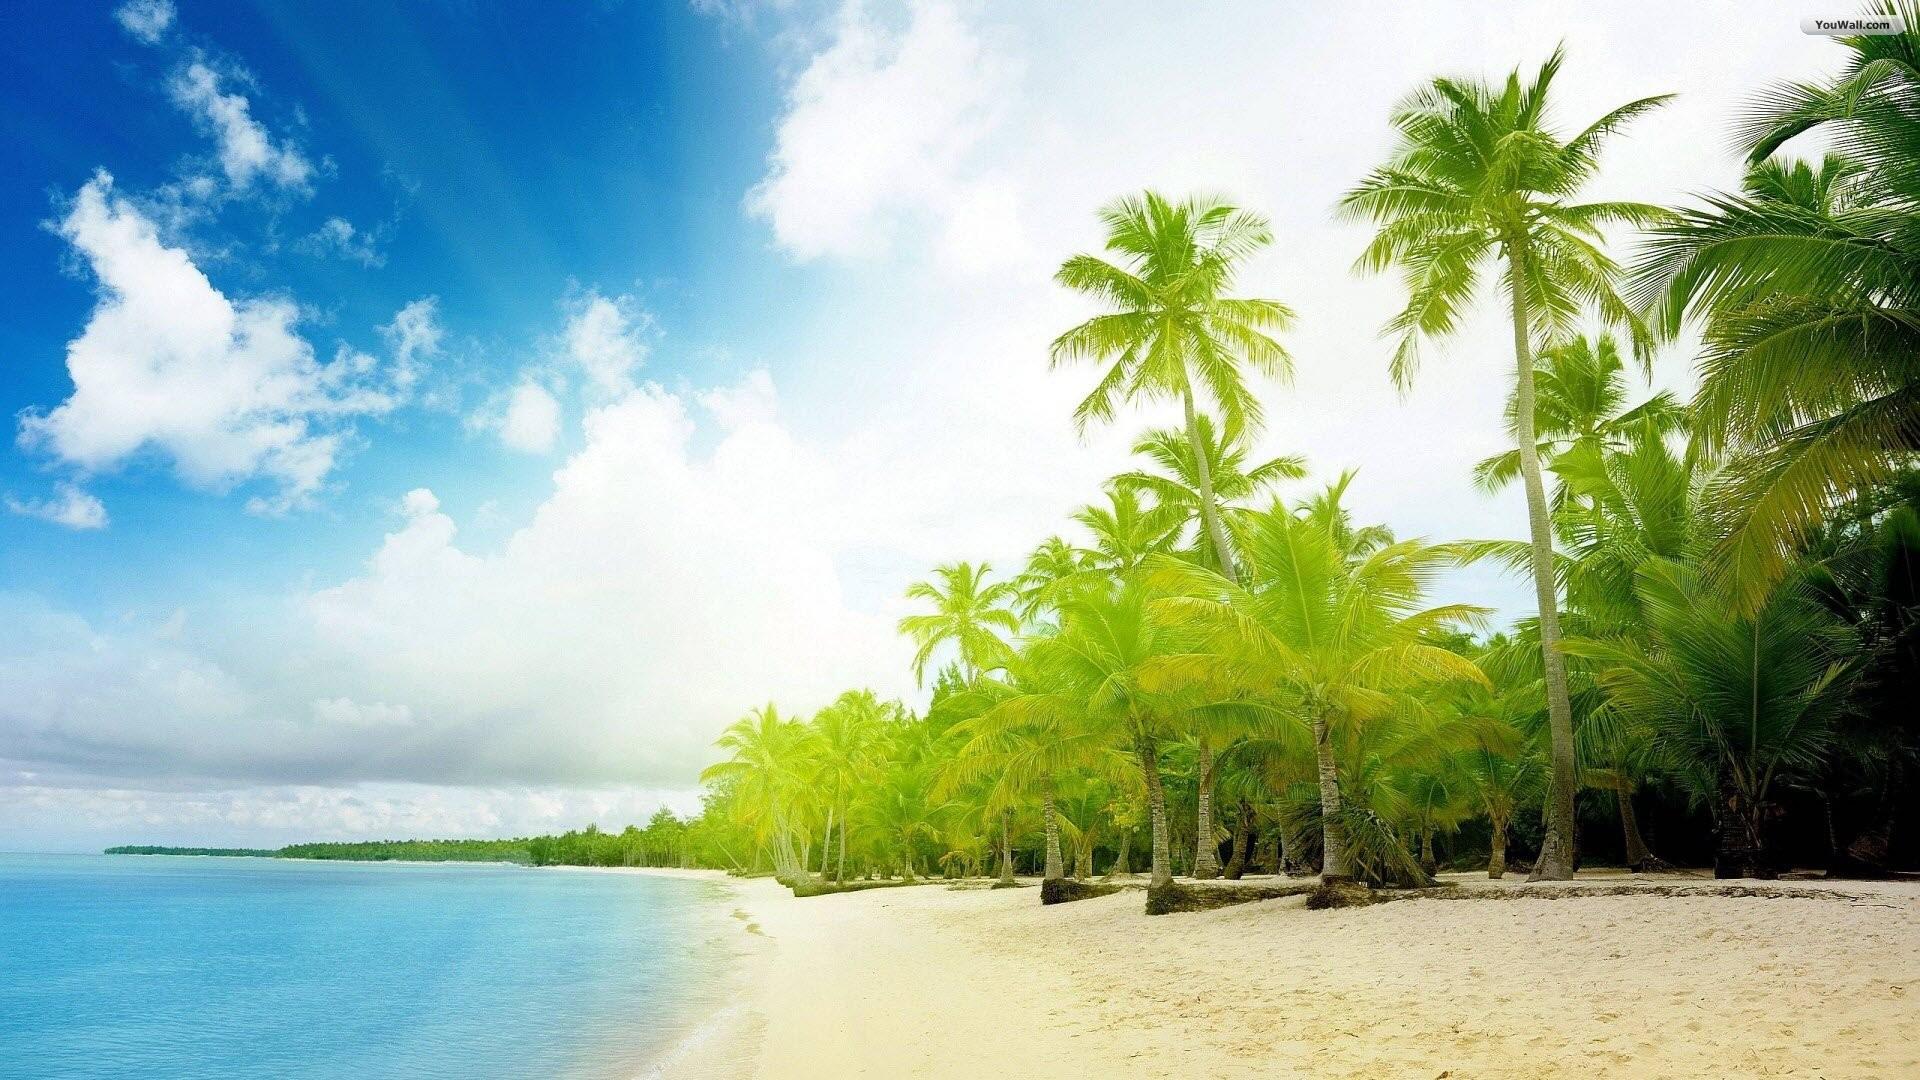 Beautiful HD Wallpapers Of Beach